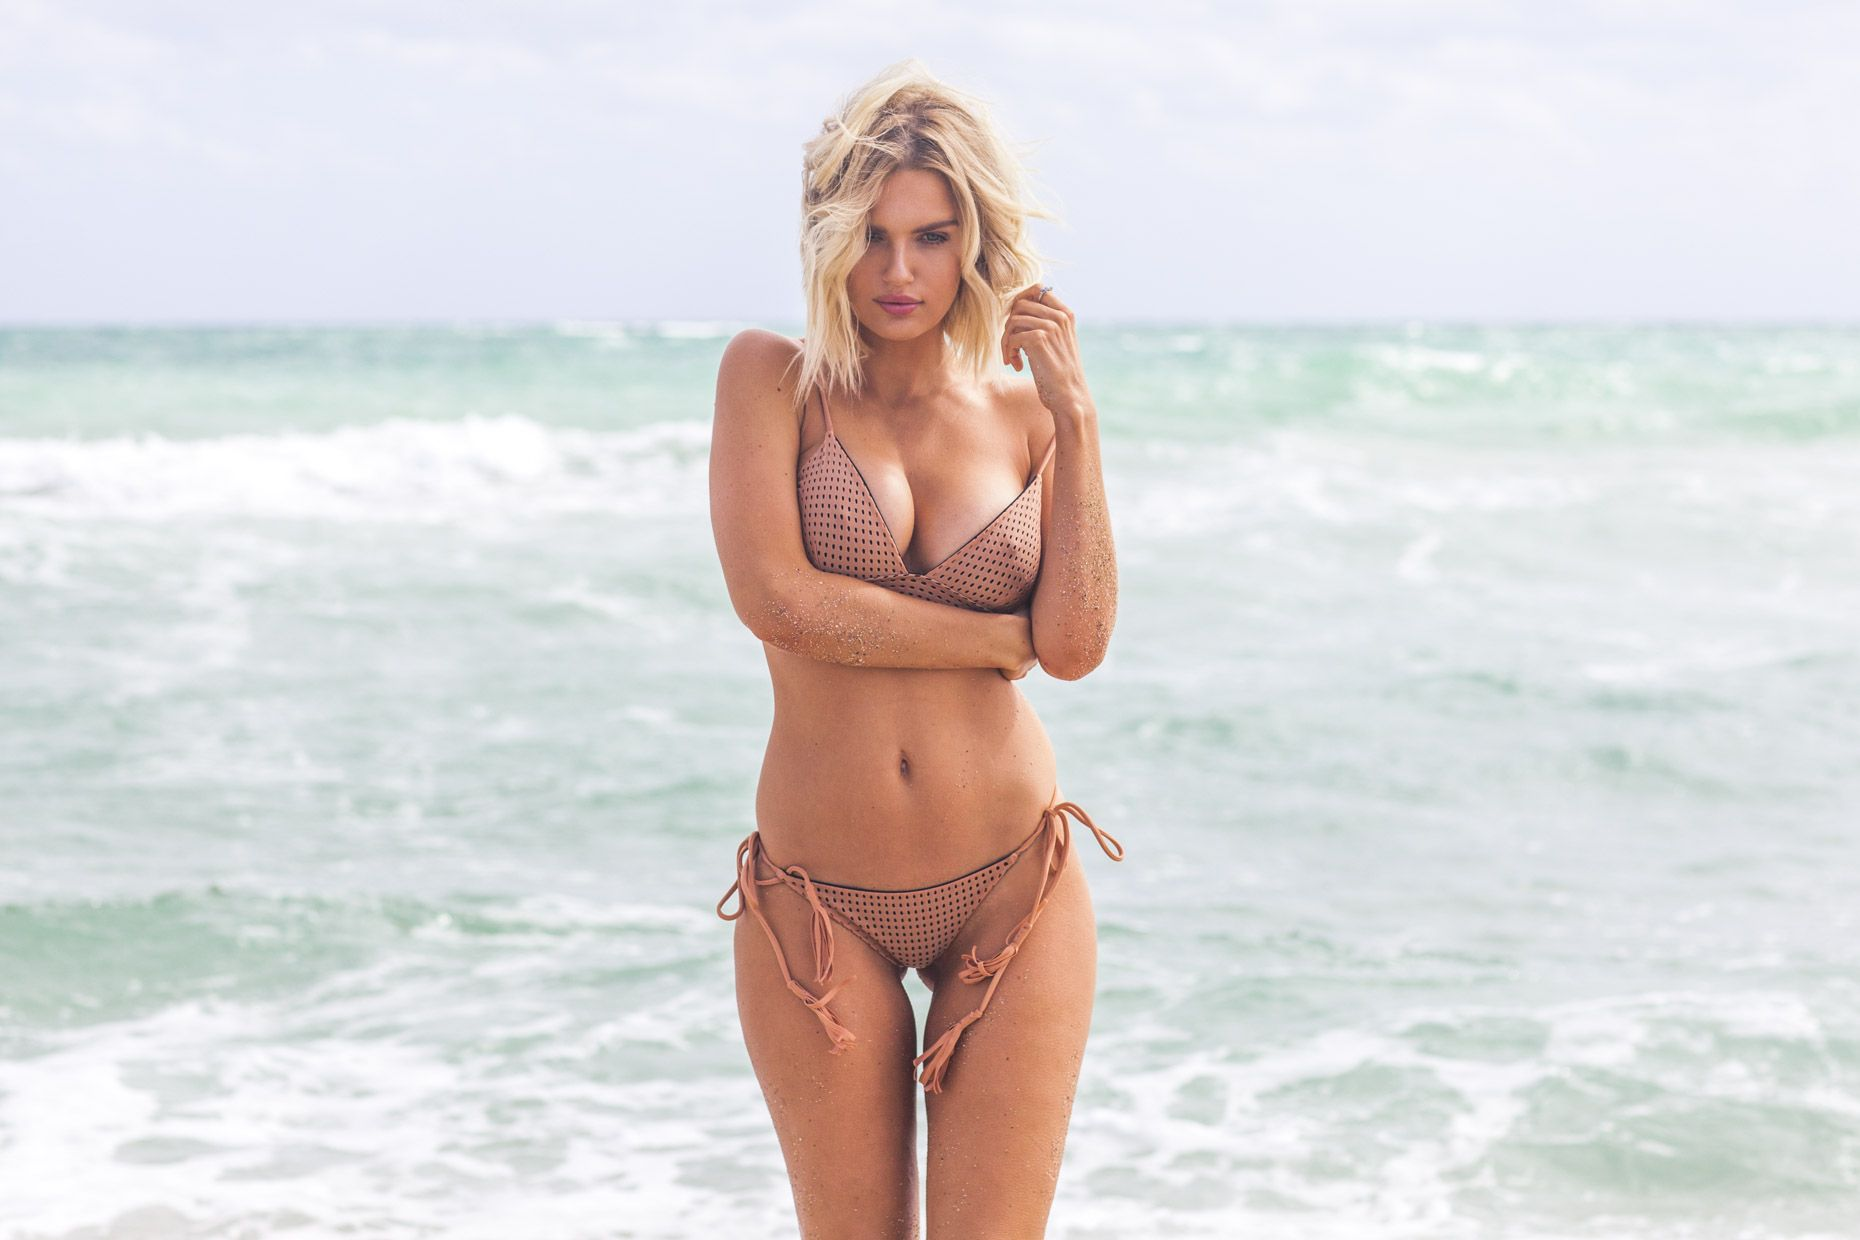 Rachel Mortenson Nude Photos Thefappening